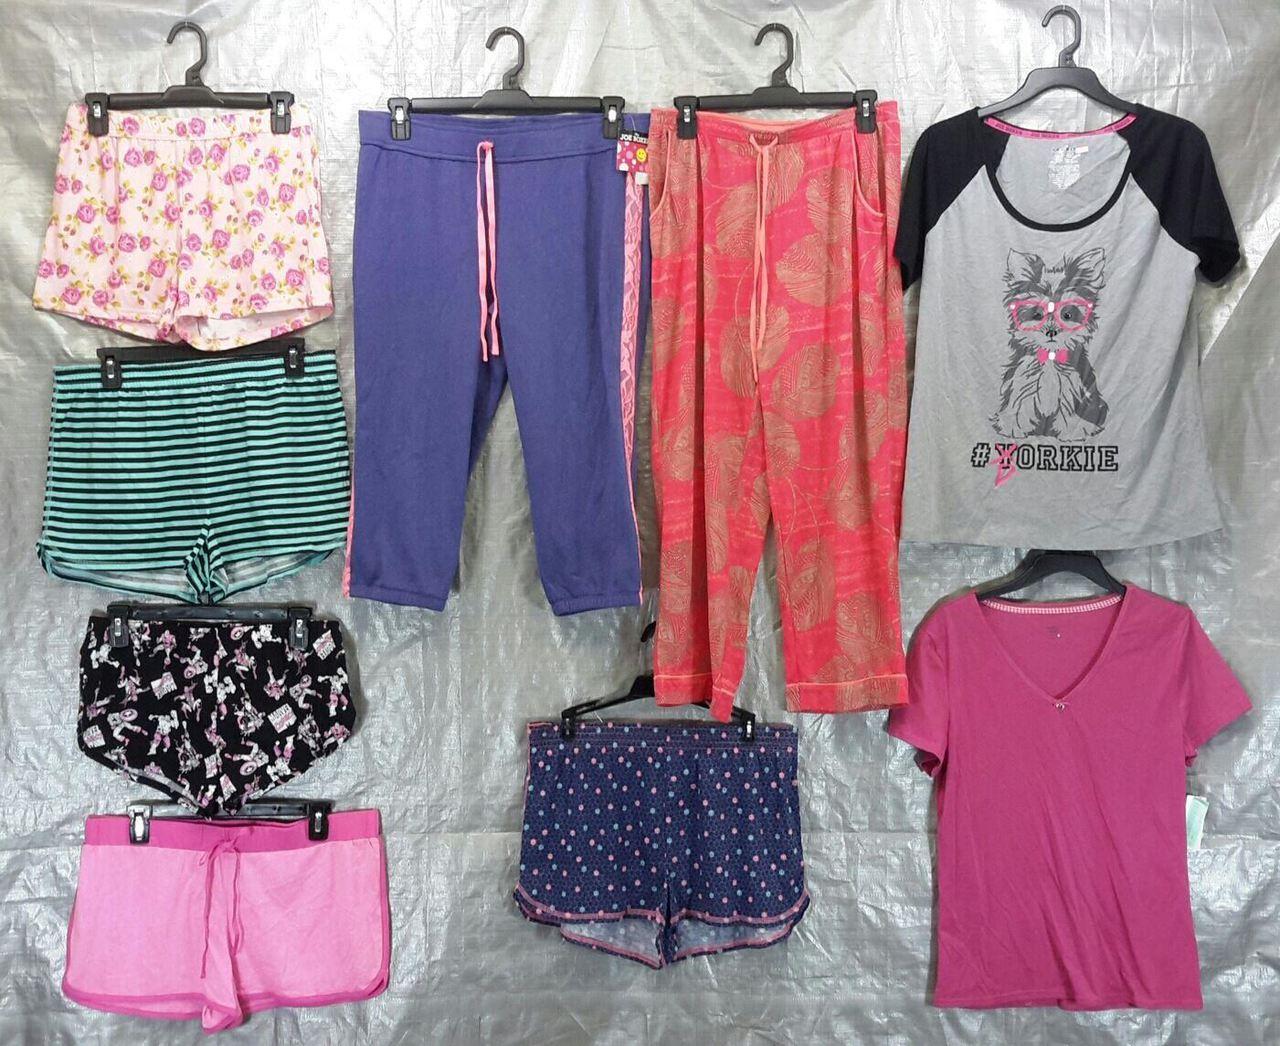 Wholesale Lot of 50 Assorted Sleep Tops Bottoms PAJAMAS Sleepwear Womens S-L Sizes